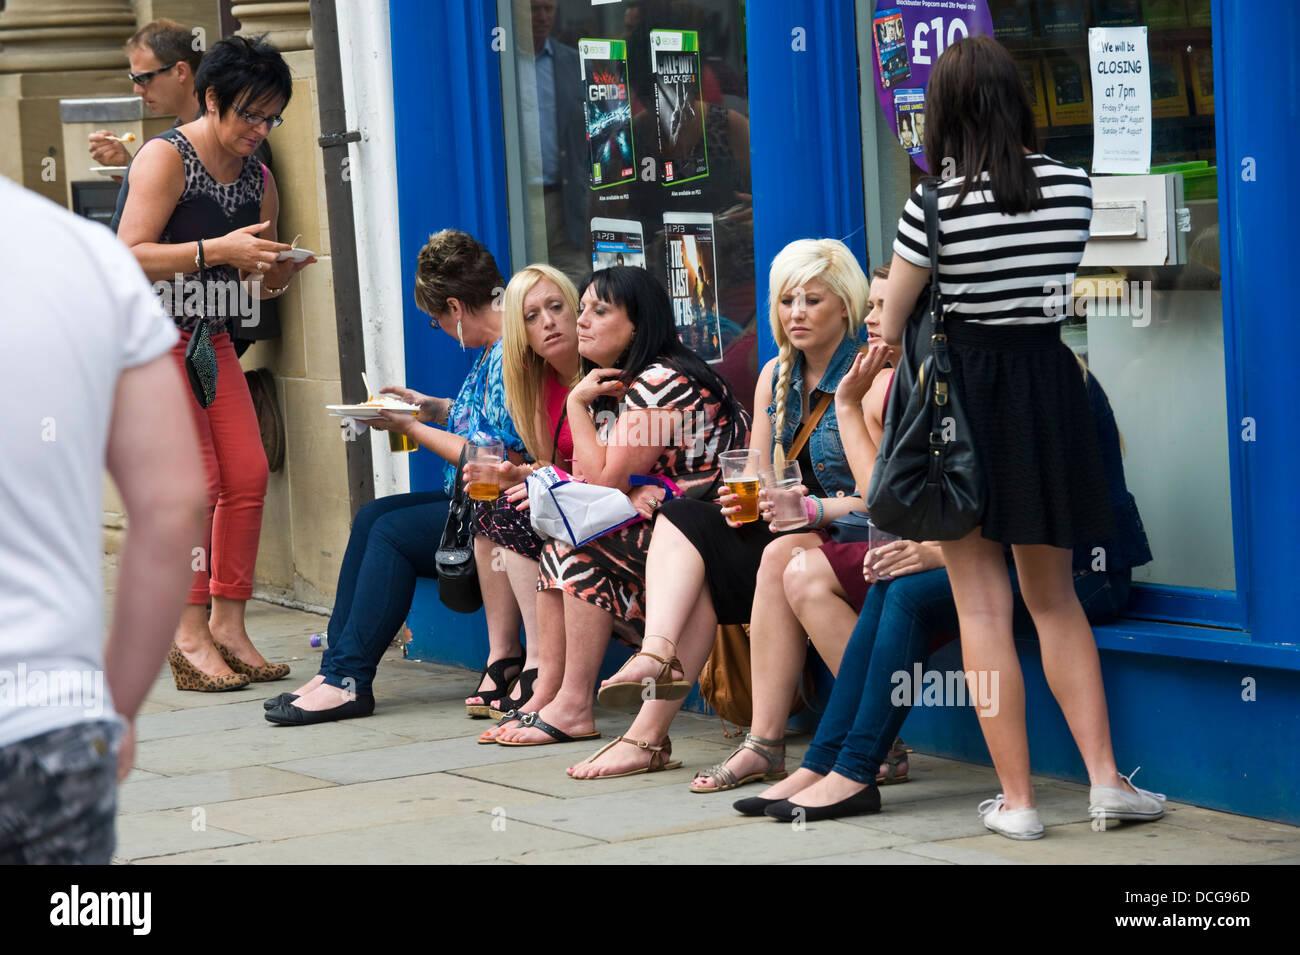 Binge Drinking Uk Women Stockfotos & Binge Drinking Uk Women Bilder ...